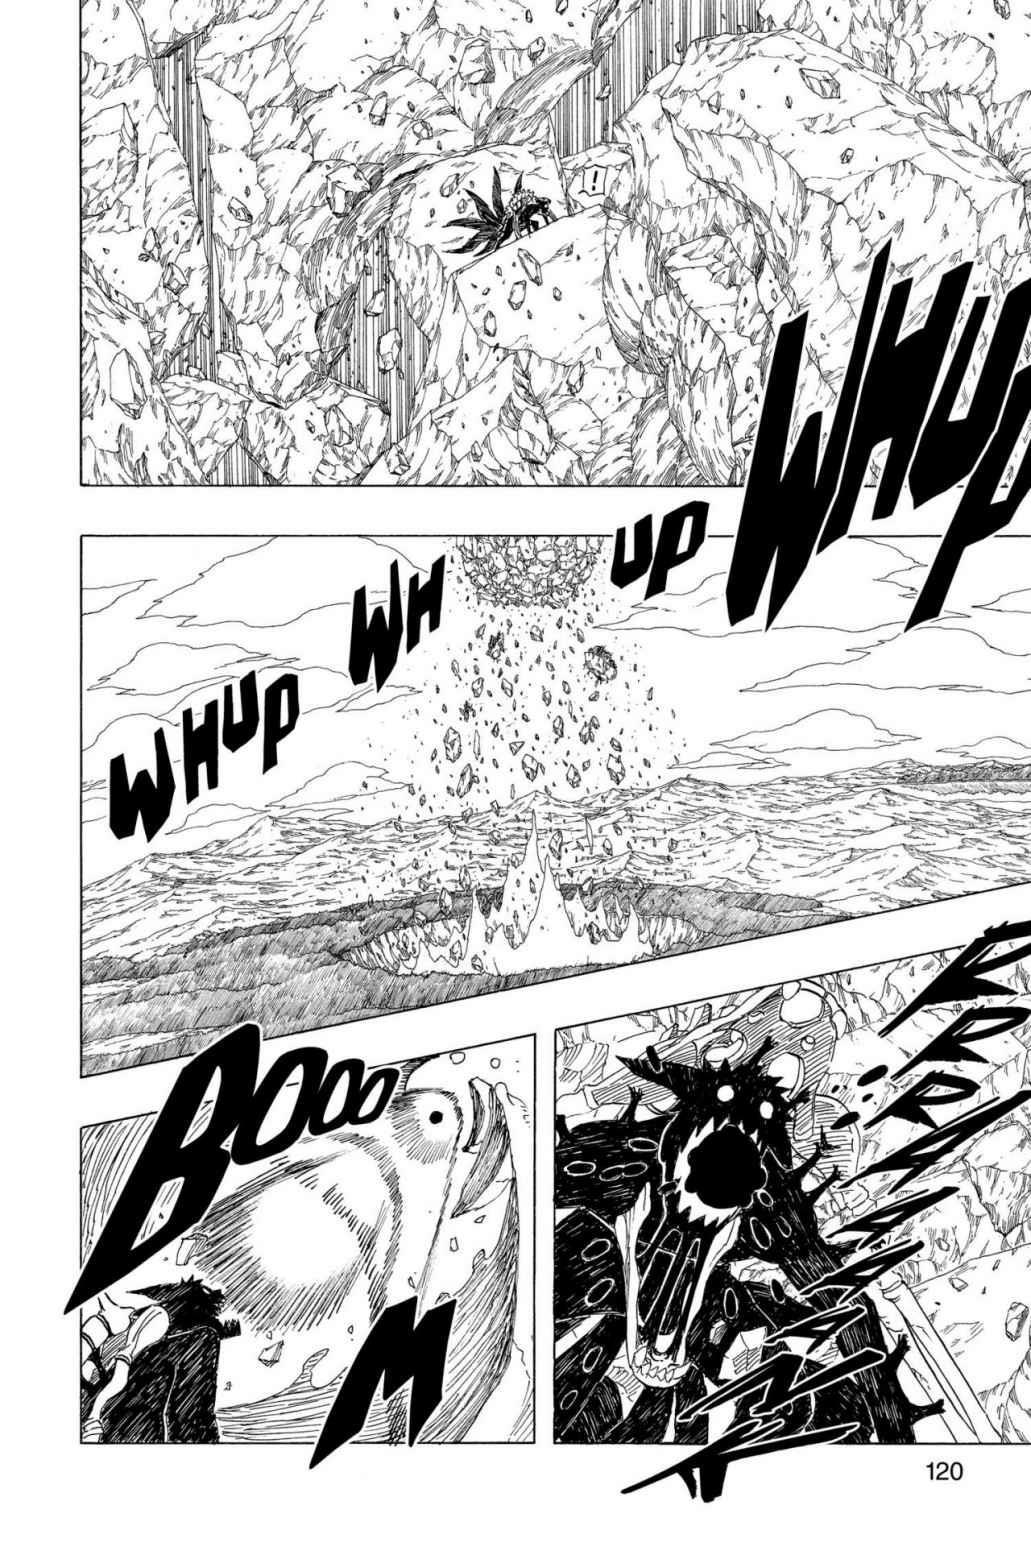 Jiraya vs Nagato - Página 3 0439-004